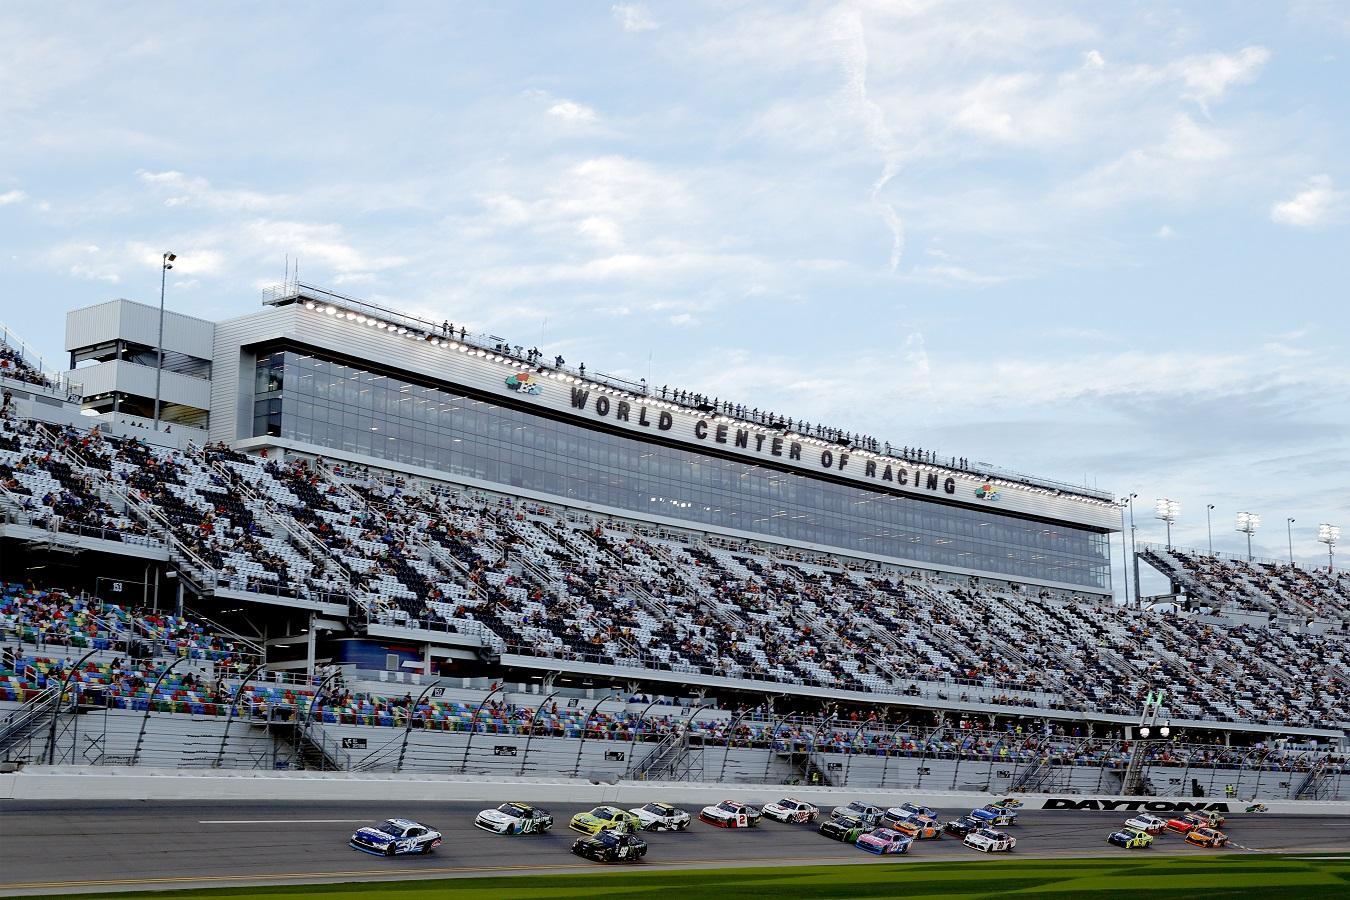 Wide shot of Daytona International Speedway